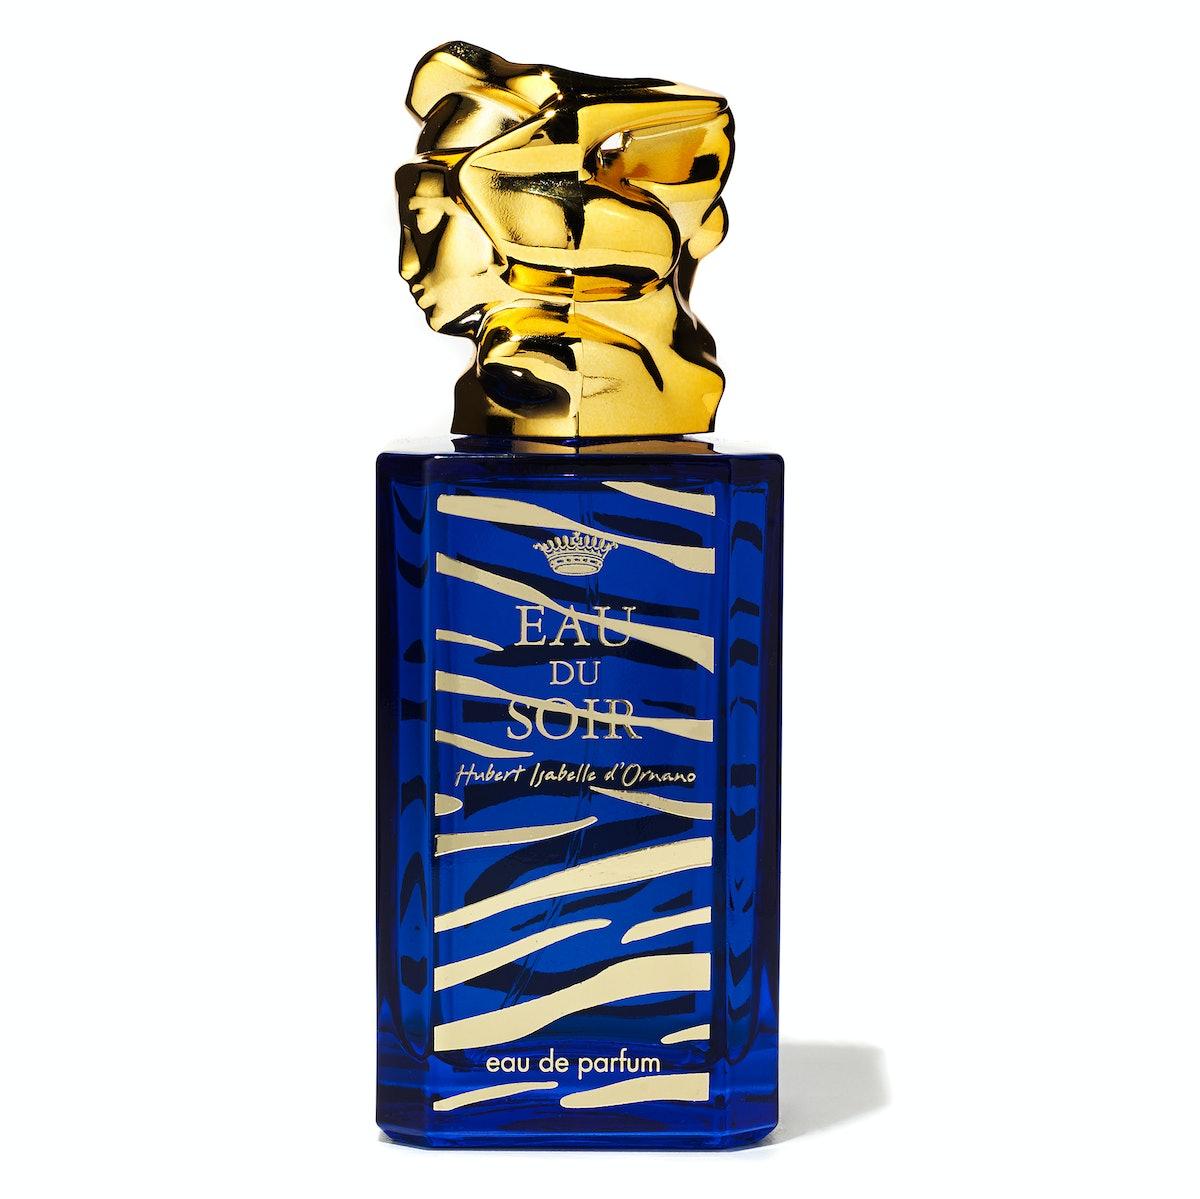 Sisley Eau du Soir holiday edition eau de parfum